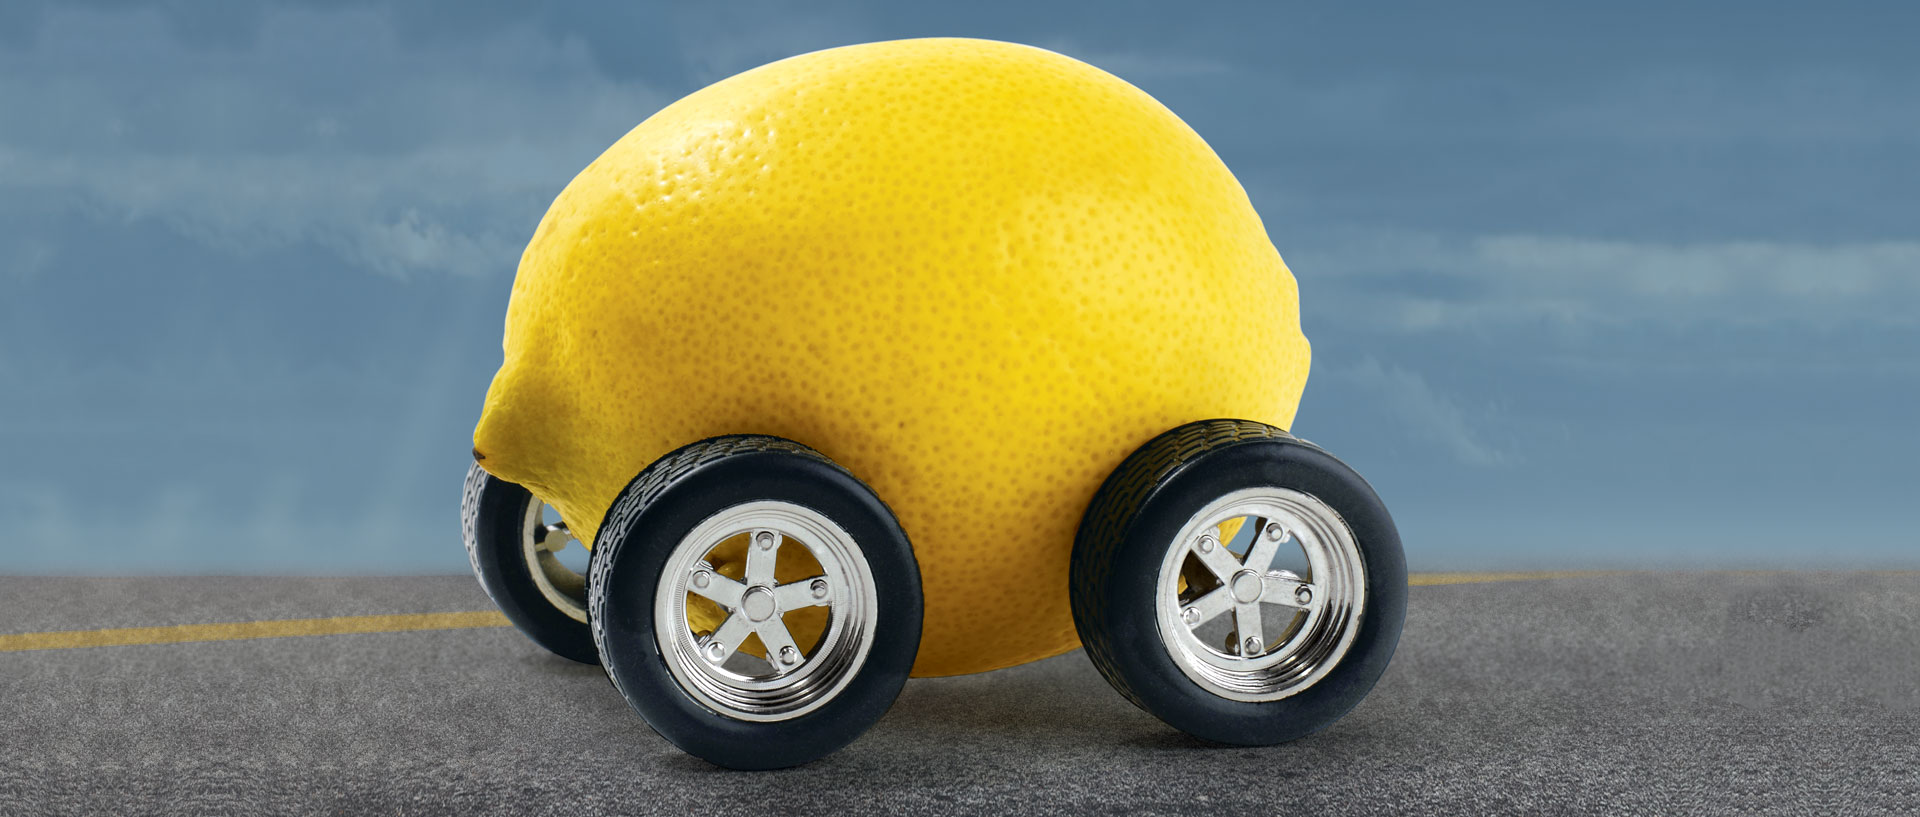 florida lemon on new cars - 28 images - lemon yellow sun nsra ...